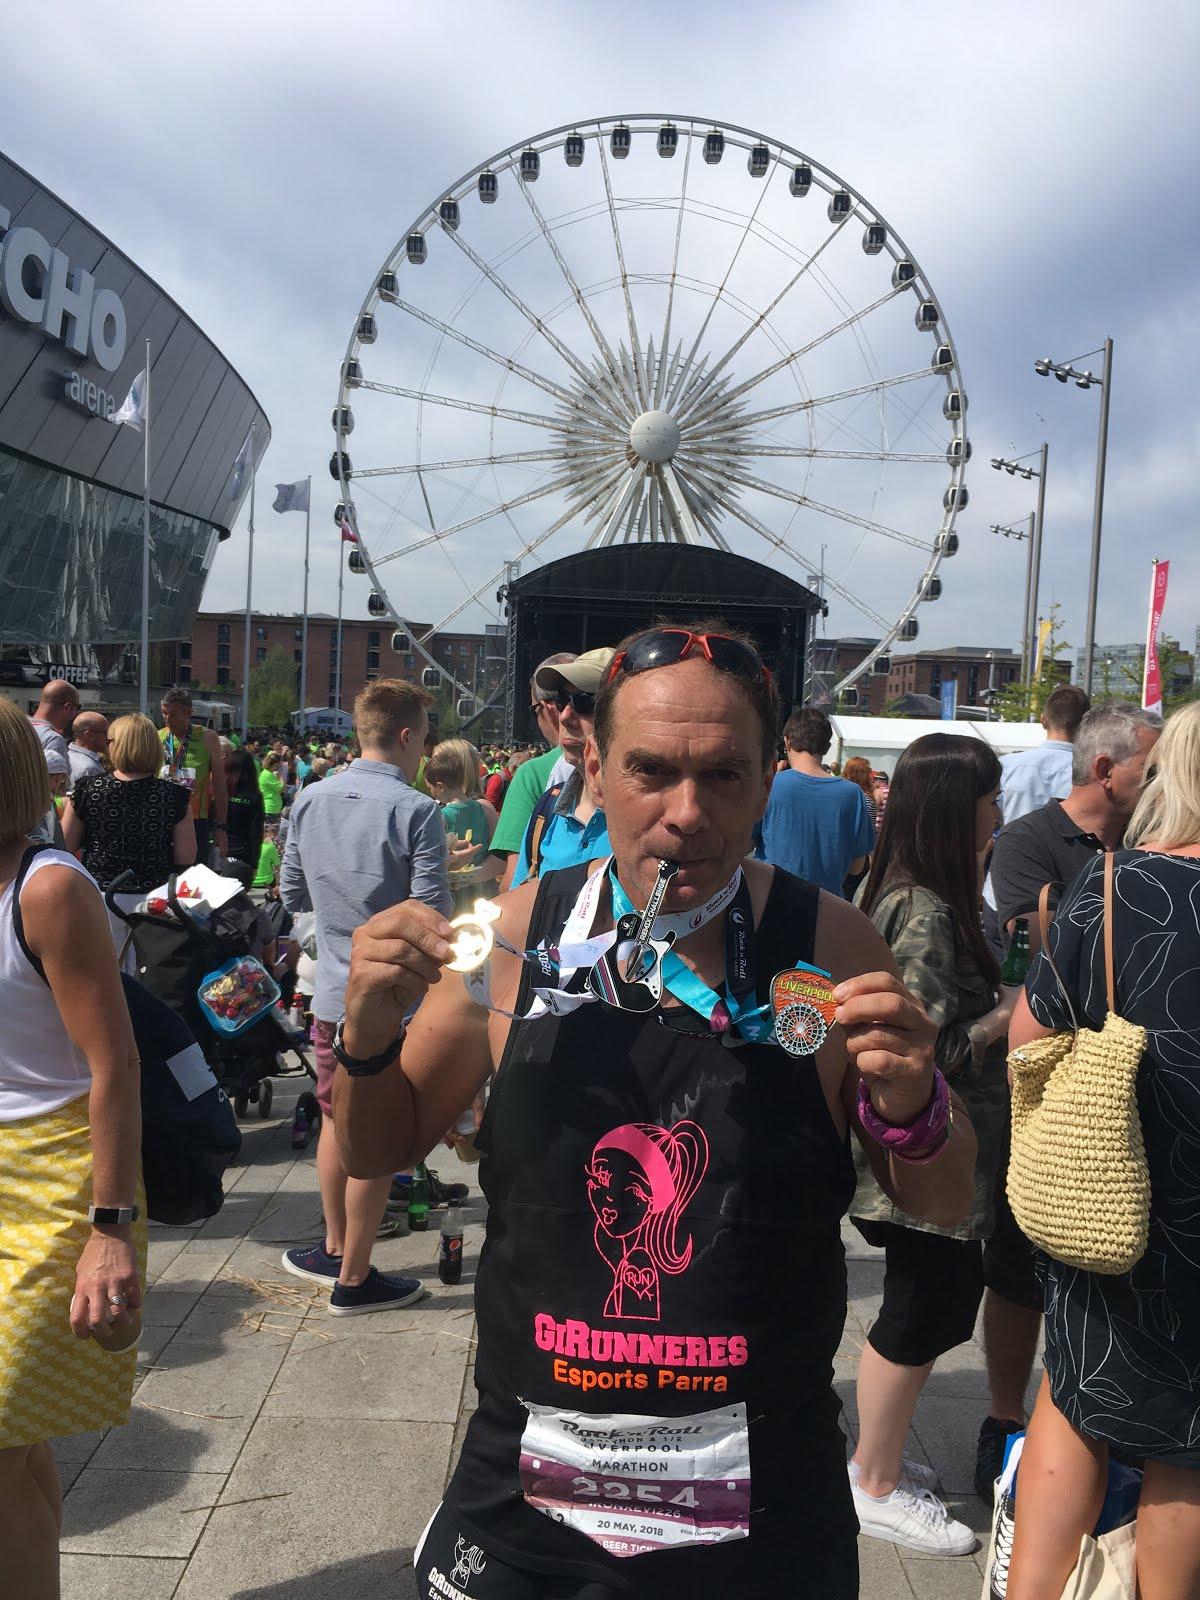 Liverpool Marathon (20-5-2018)